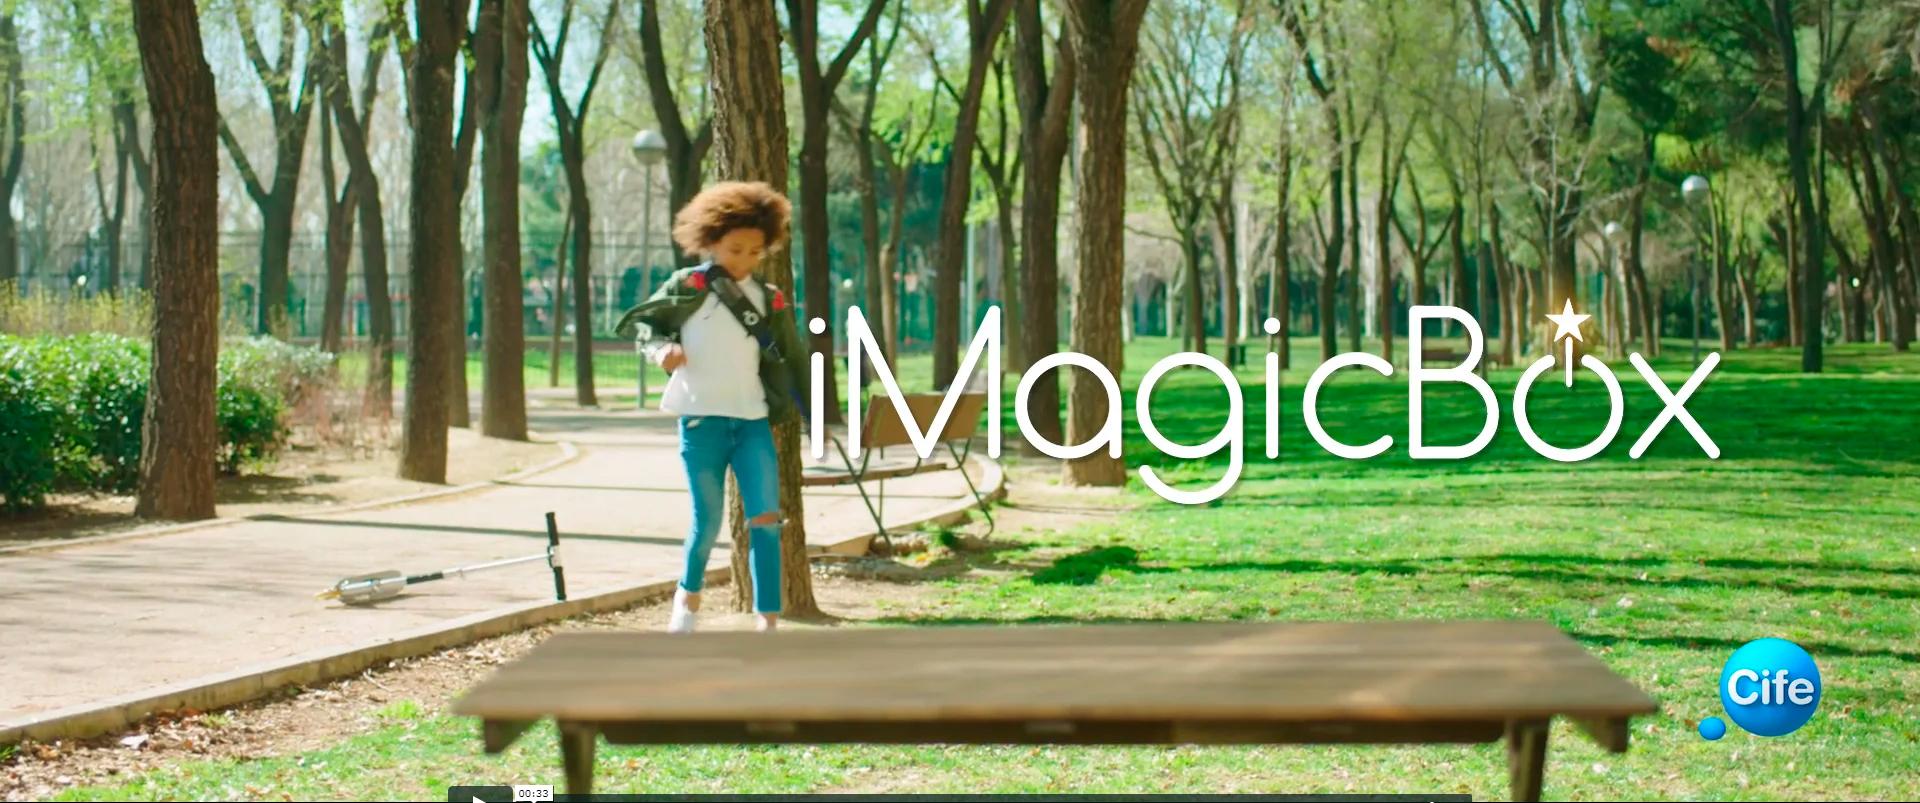 spot_imagic_box